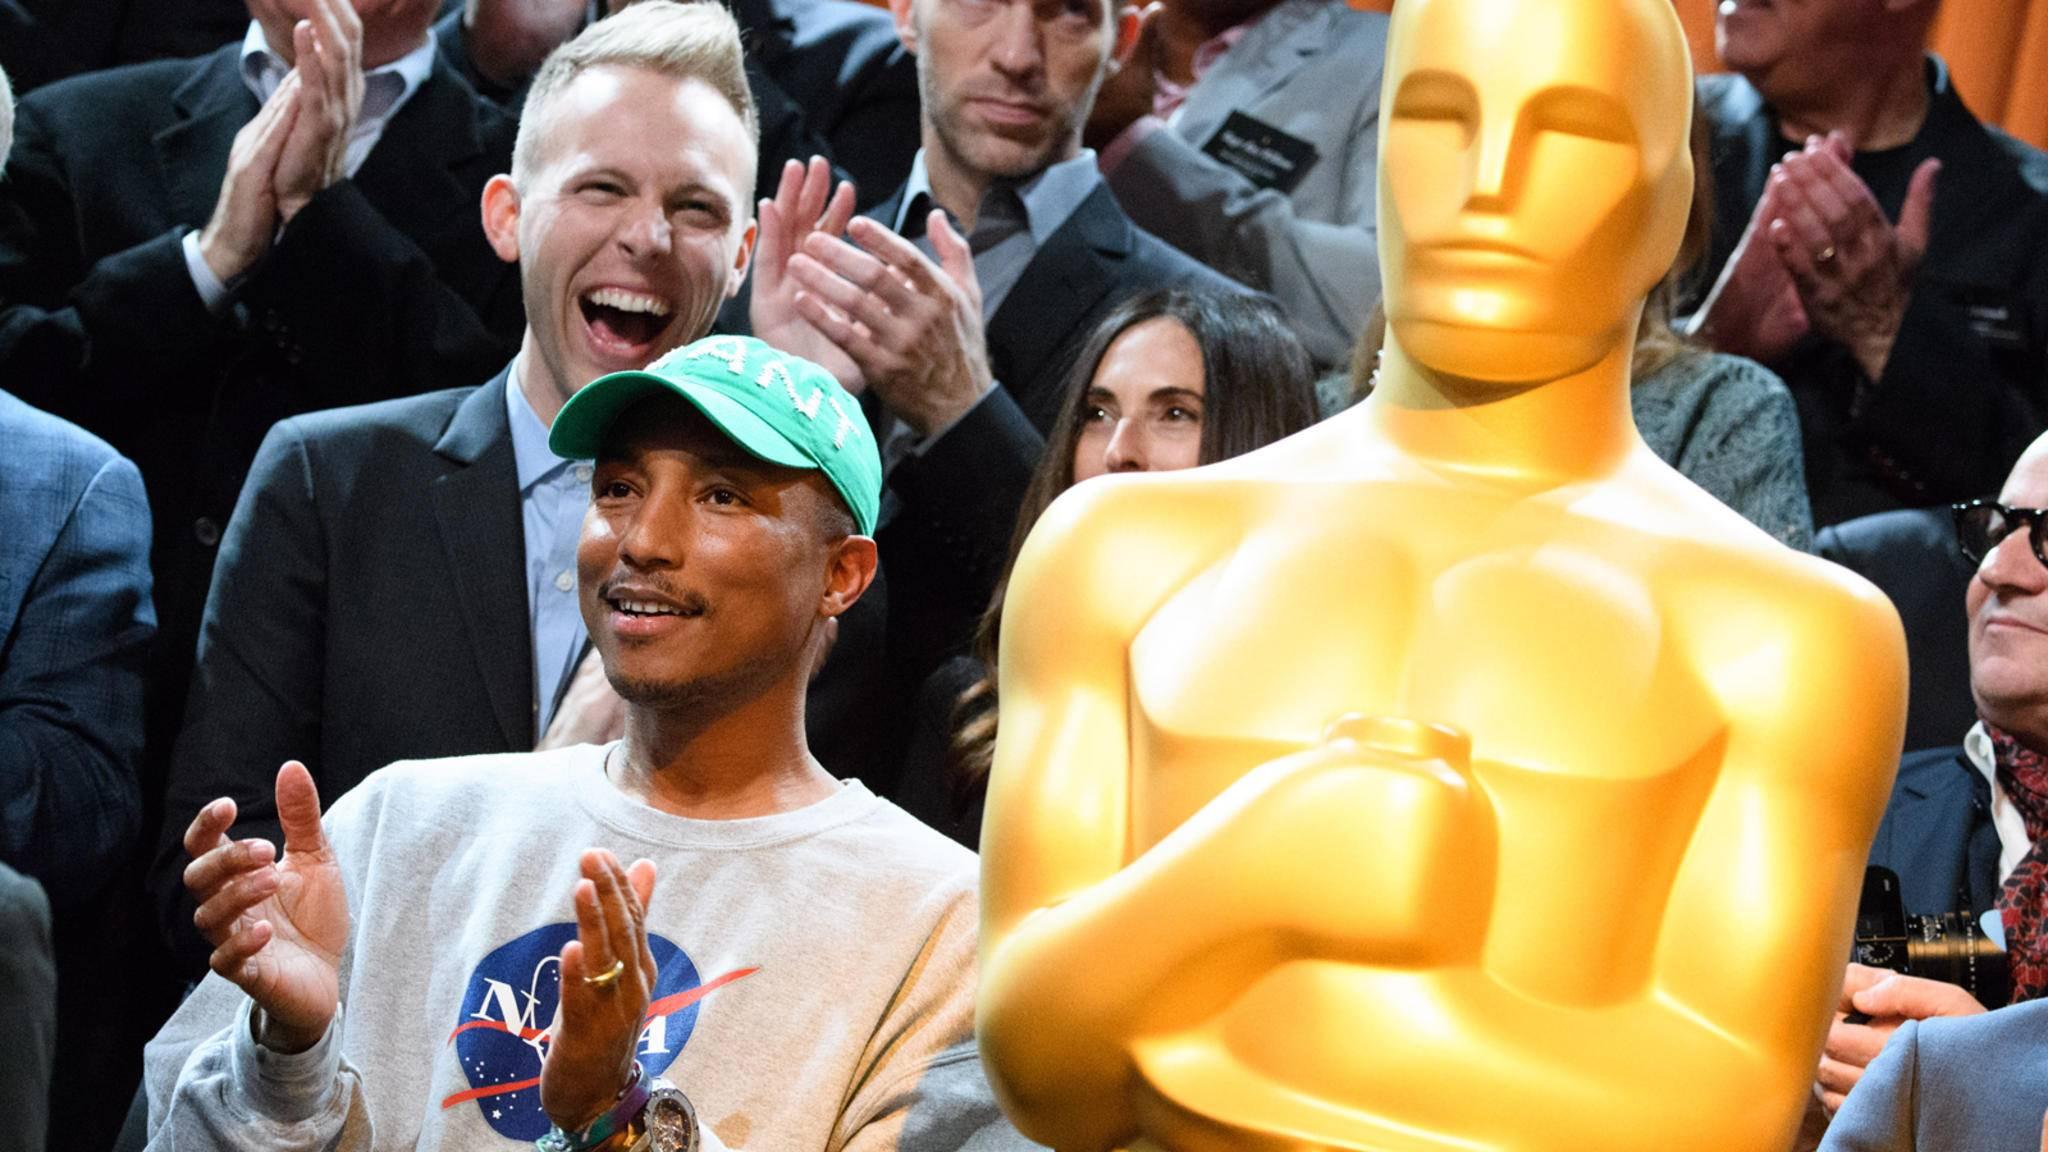 Ob Pharrell Williams bei den Oscars 2017 erfolgreich ist?